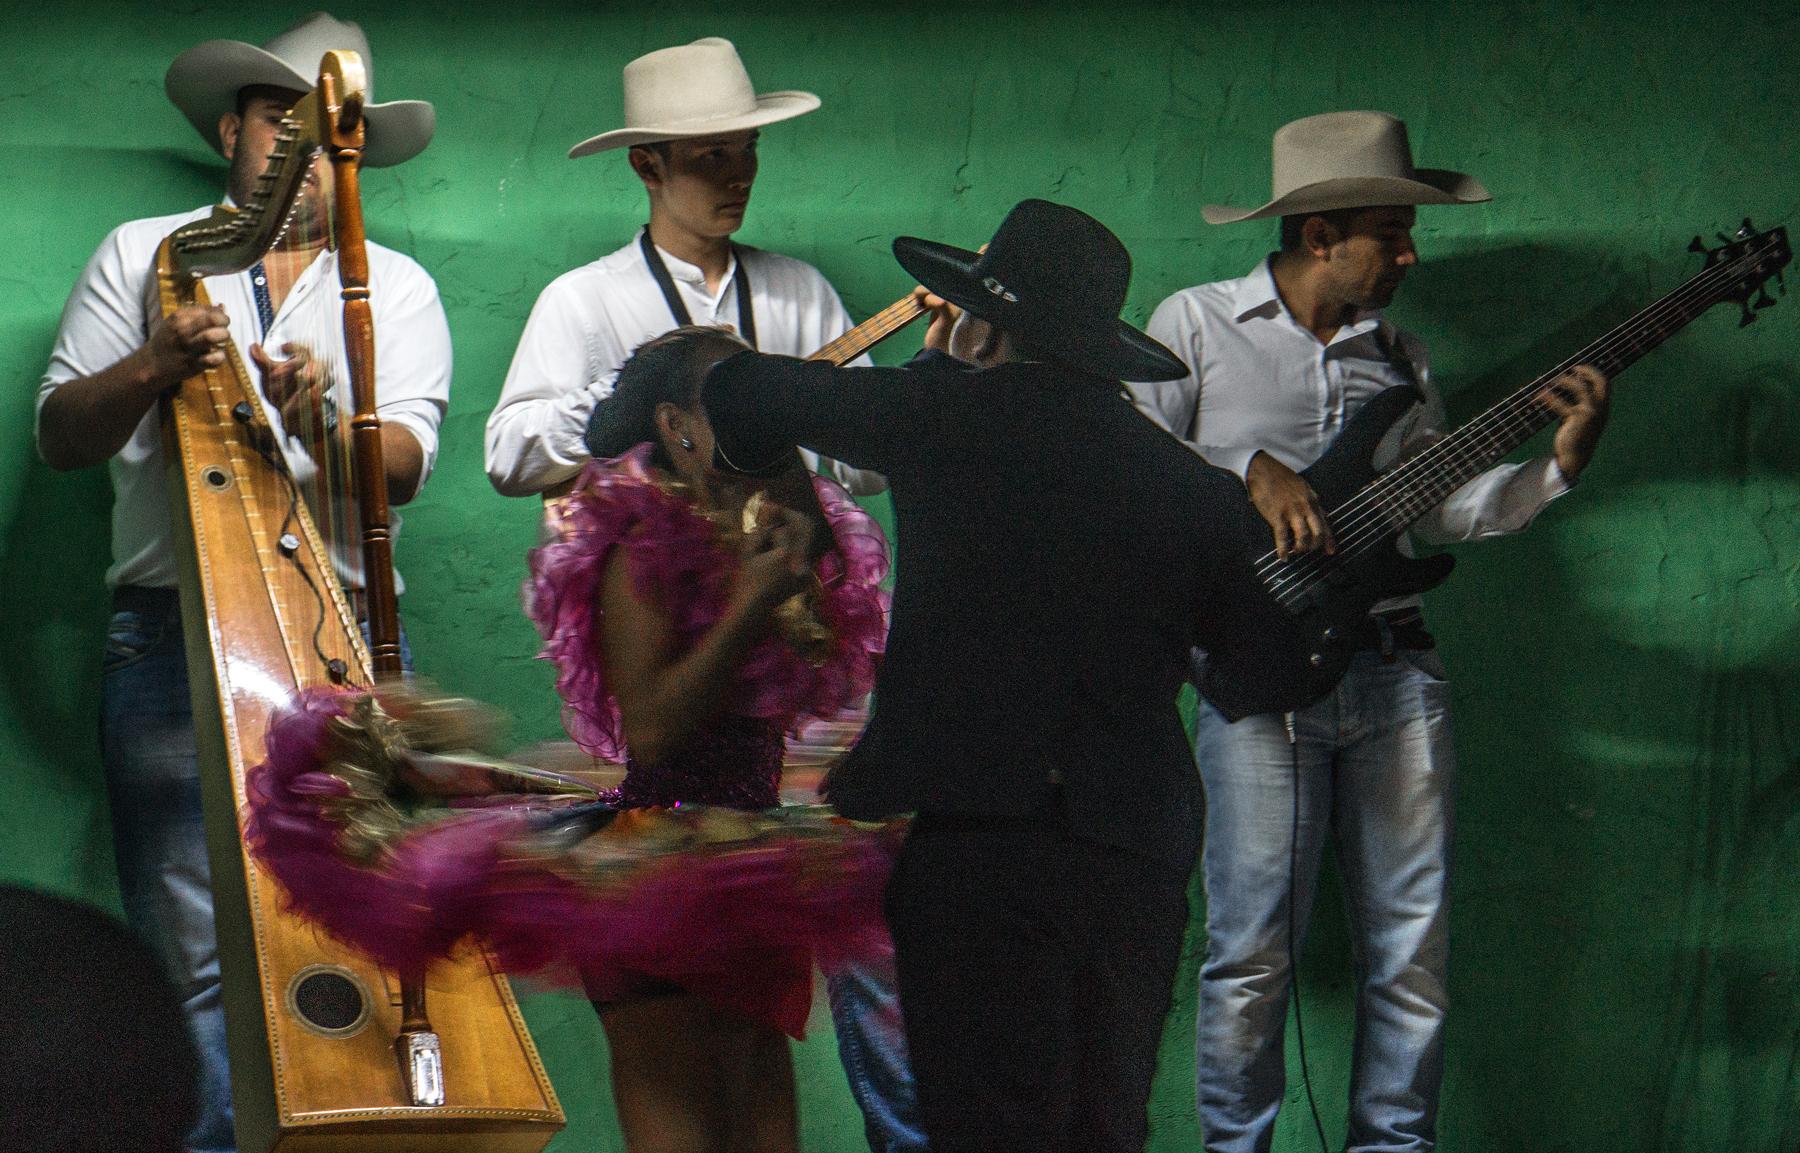 Colombia, Llanos, folklore